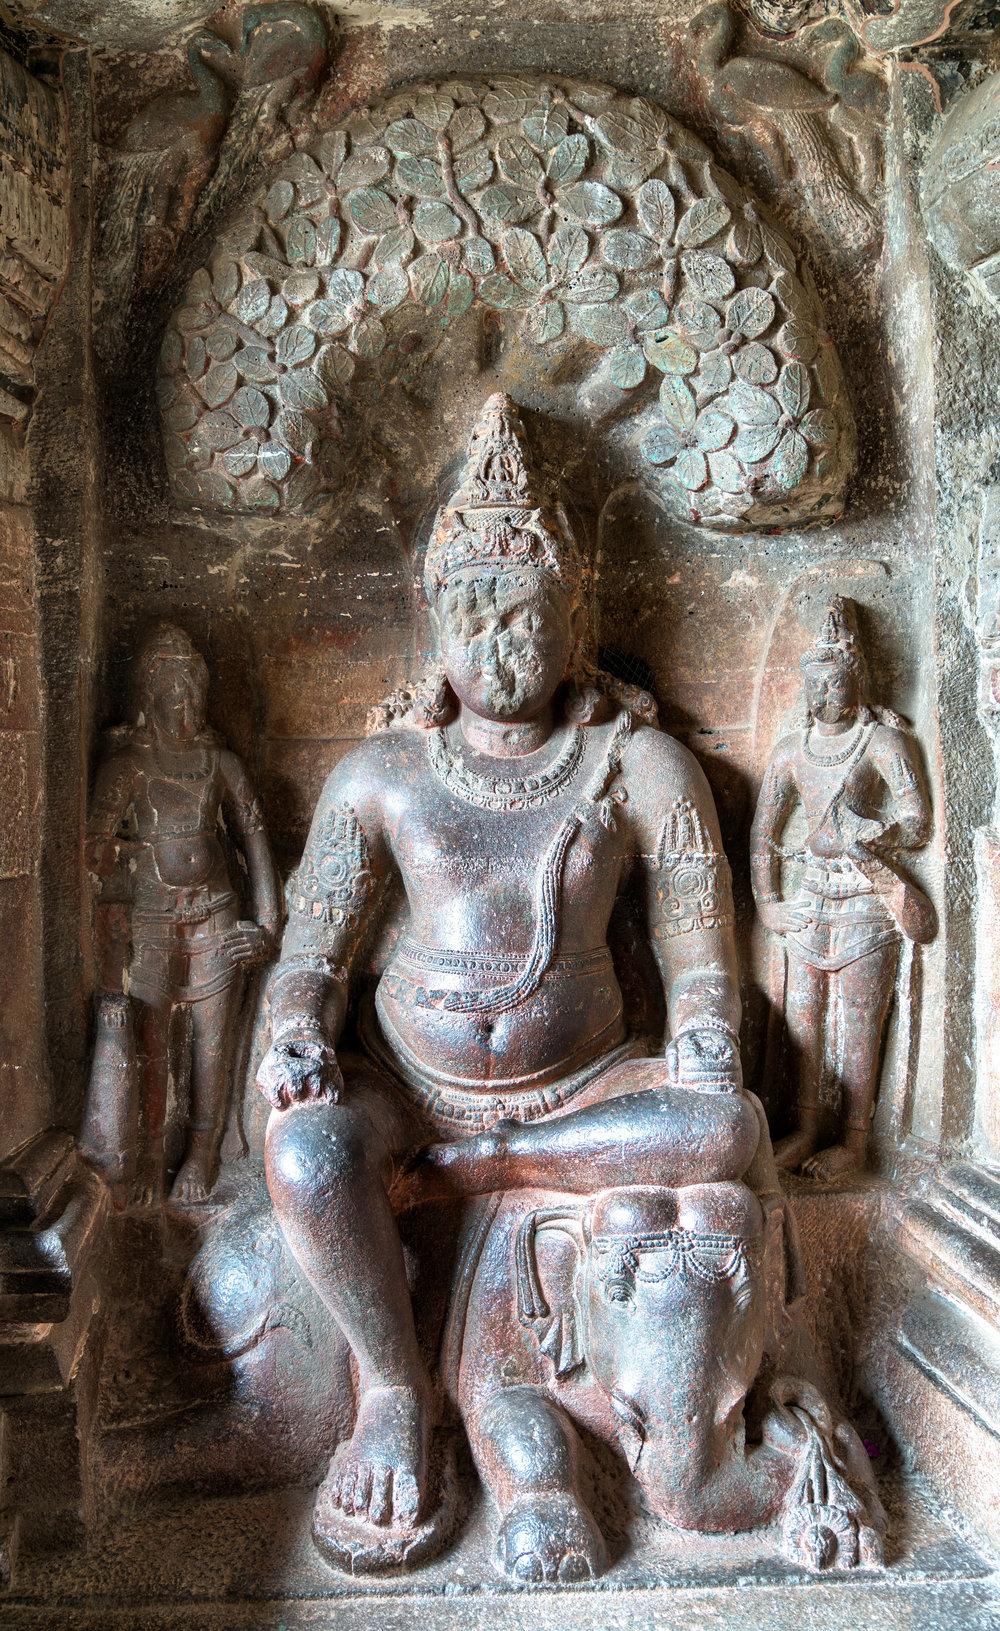 Indra (Vedic king of the gods) - Sambha temple at Ellora Caves, Maharashtra, India